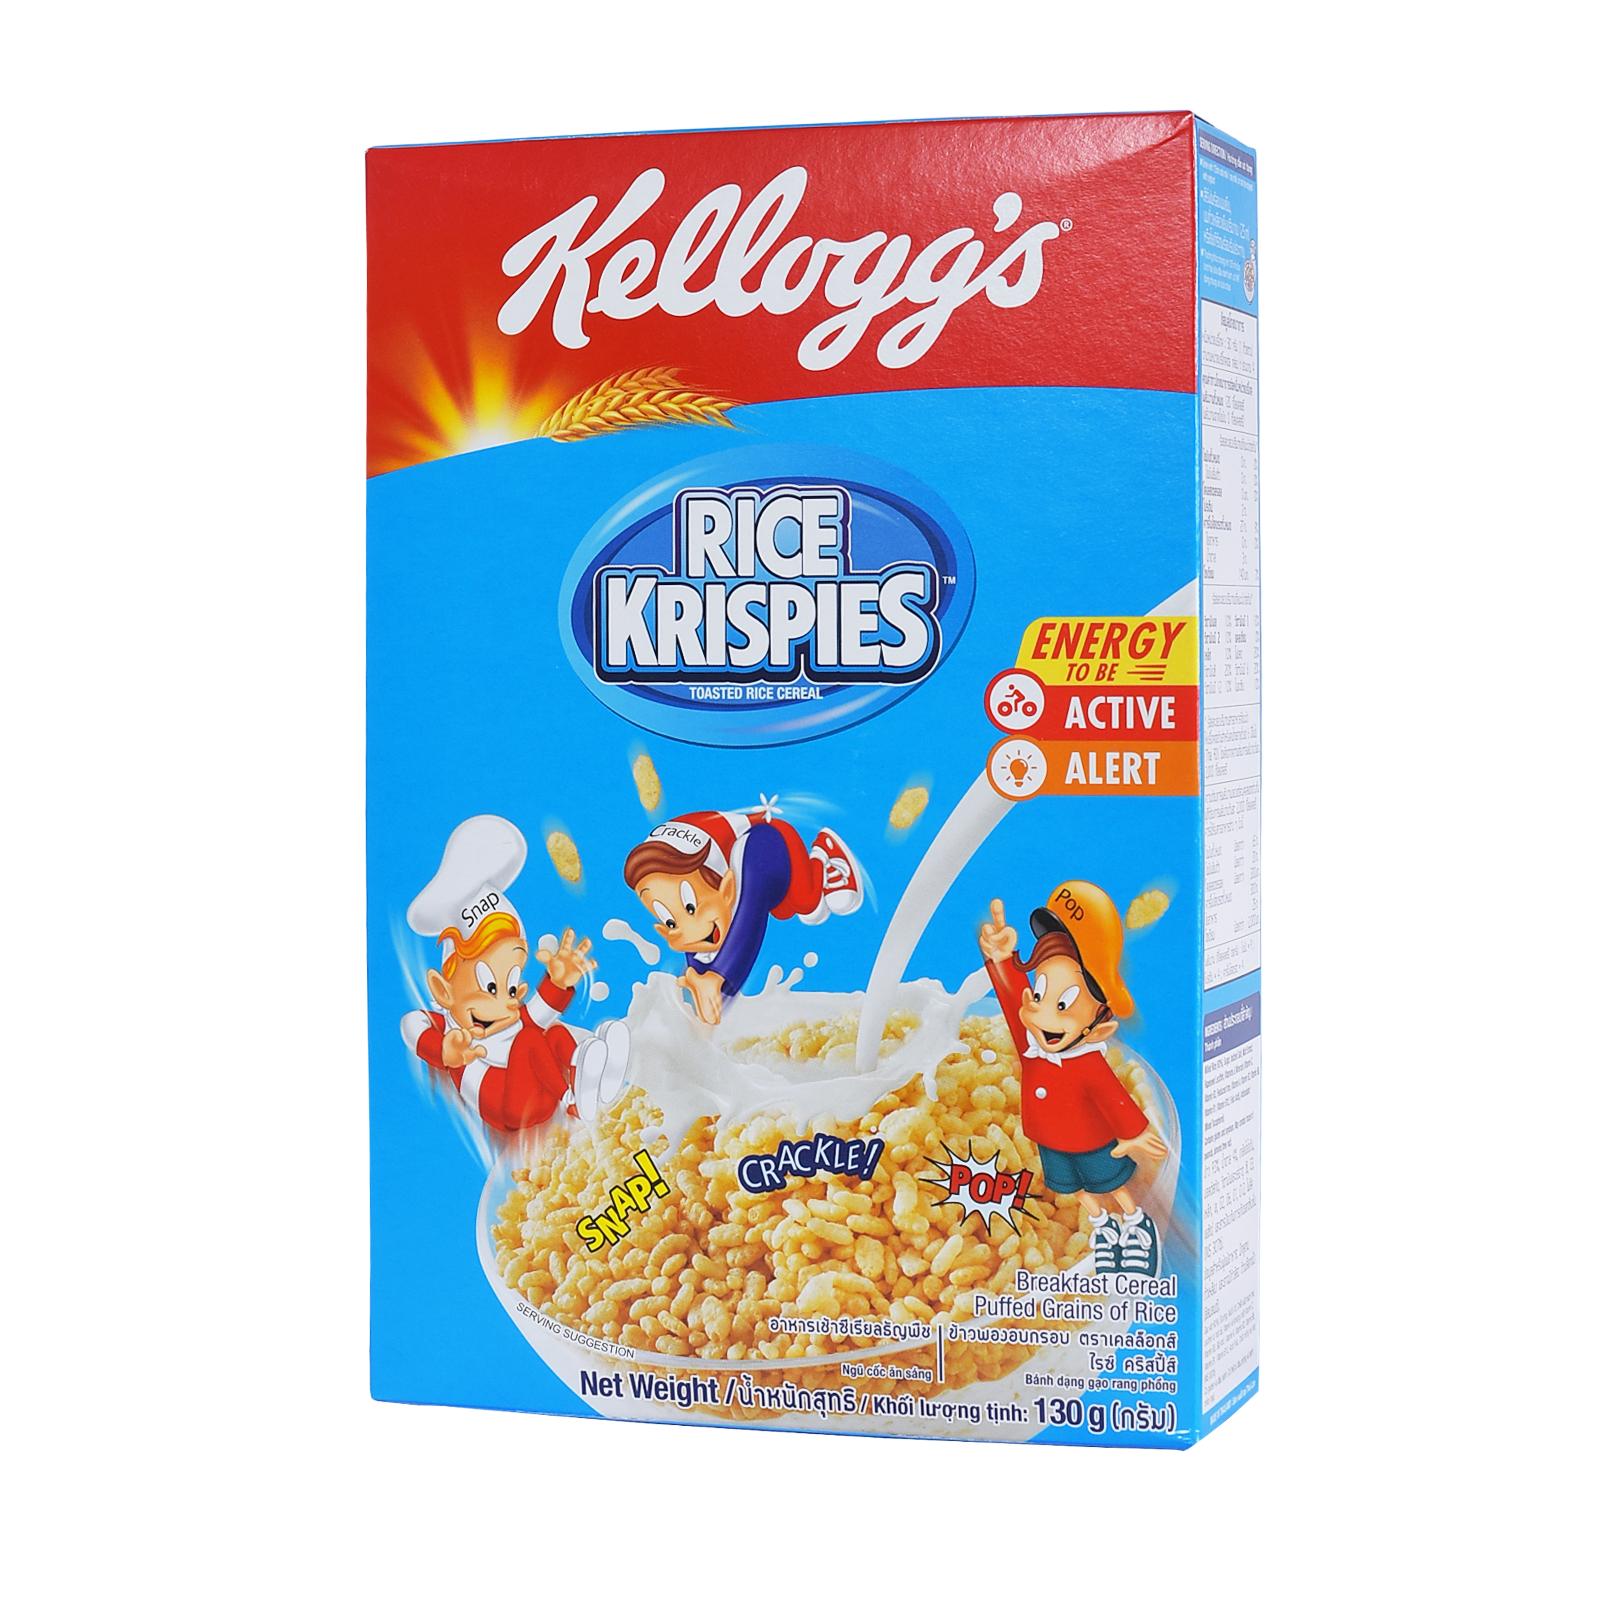 Kellogg's rice krispies.png